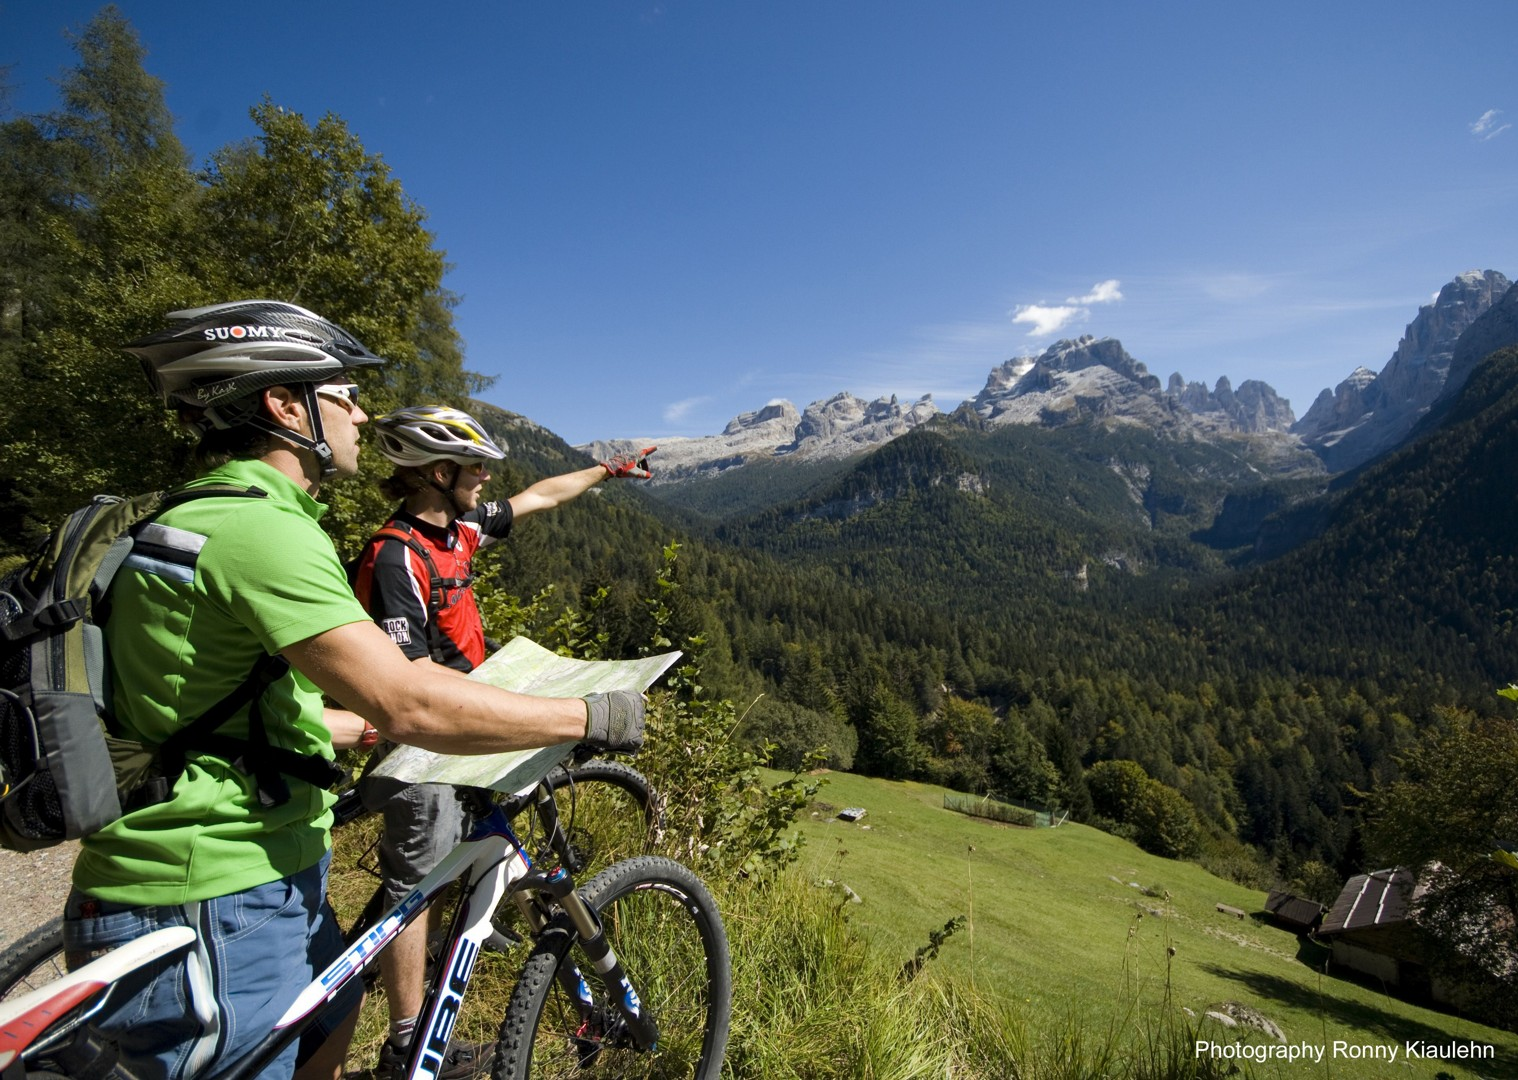 dolomites7.jpg - Italy - Dolomites of Brenta - Guided Mountain Bike Holiday - Mountain Biking